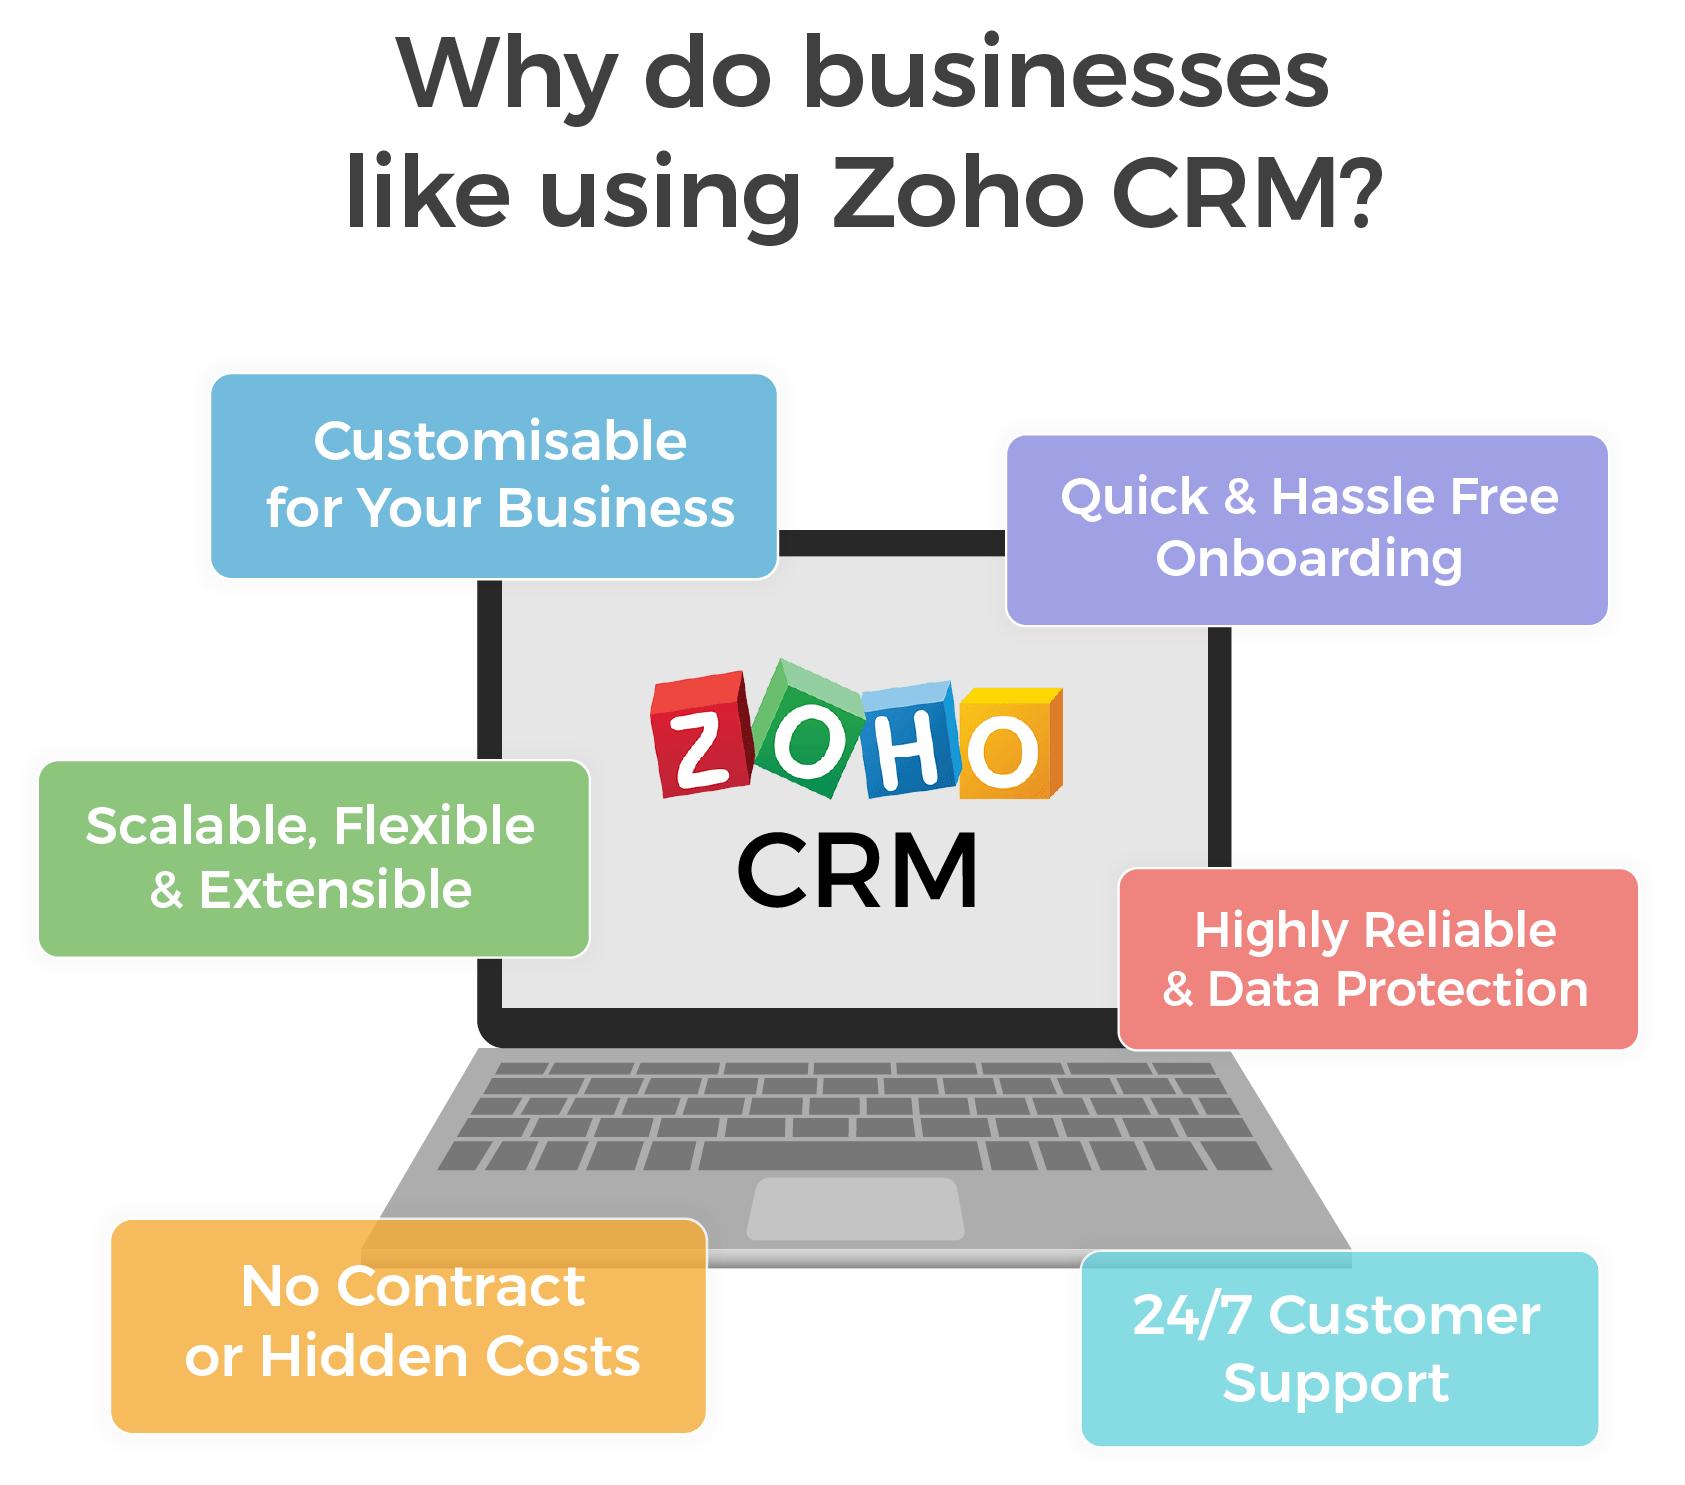 Benefits of zoho crm